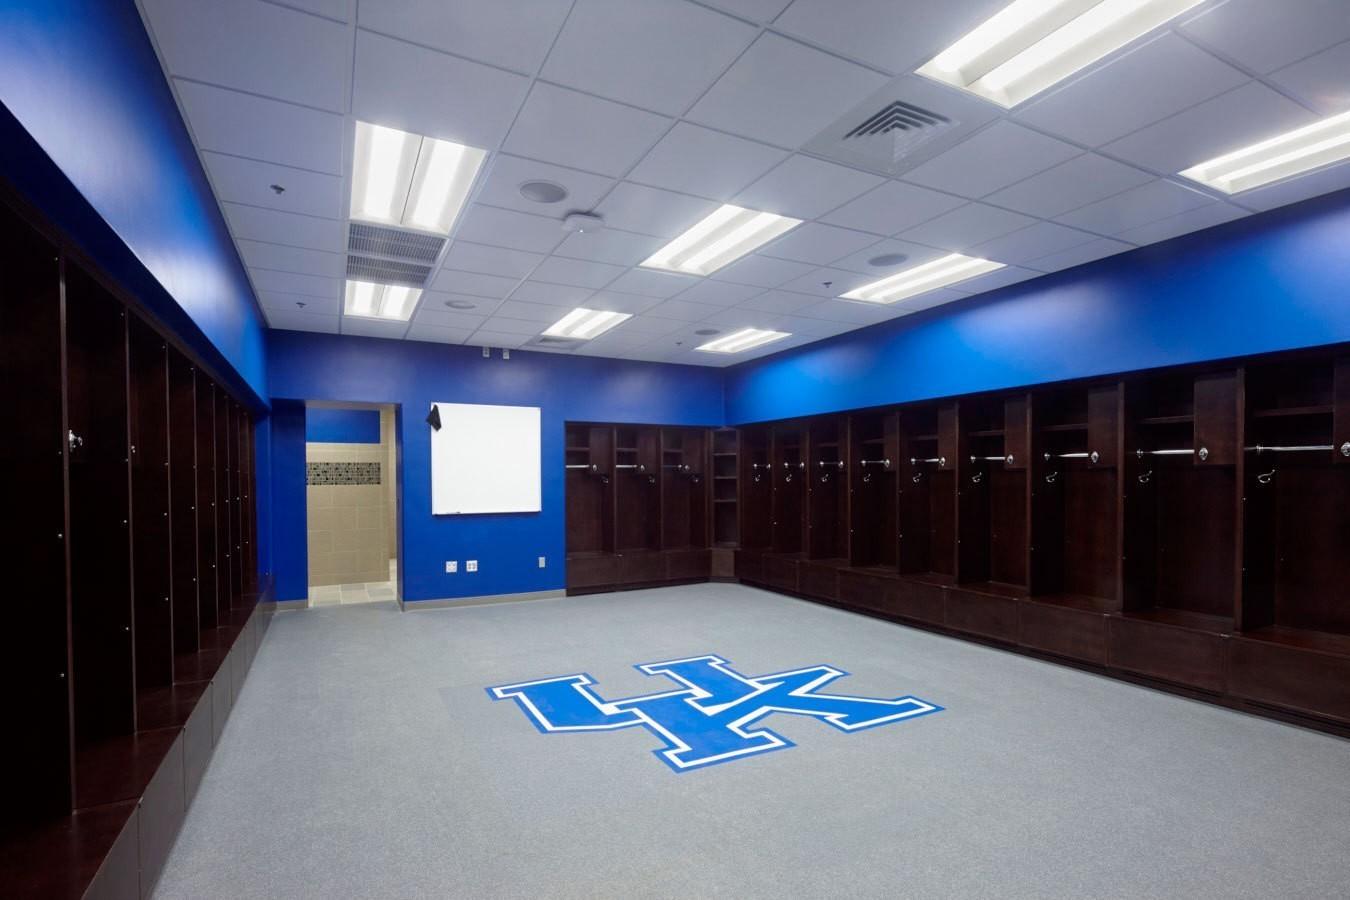 university-of-kentucky-john-cropp-softball-stadium-locker-room